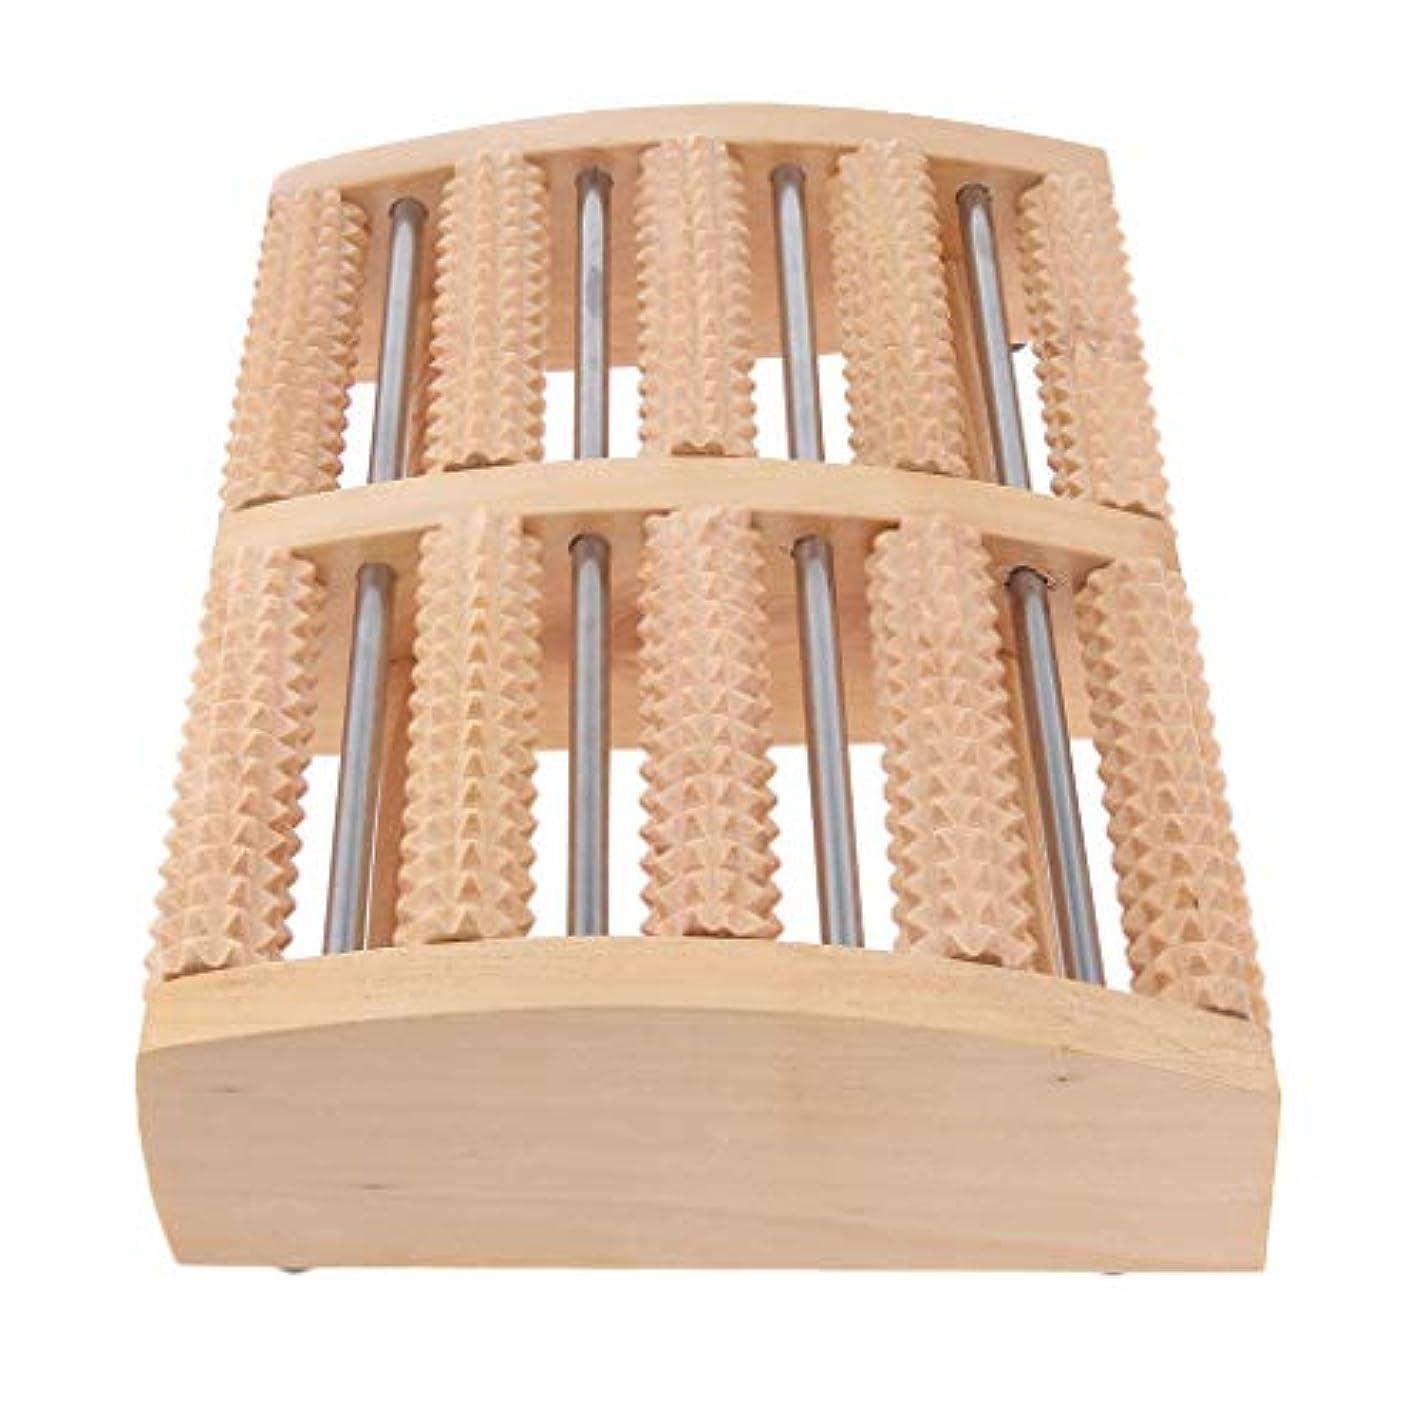 D DOLITY マッサージローラー 工芸 自然木製 足踏み フットローラー ツボ押し リラックス 健康器具 2種選ぶ - 約32×19.8×6cm, 説明したように